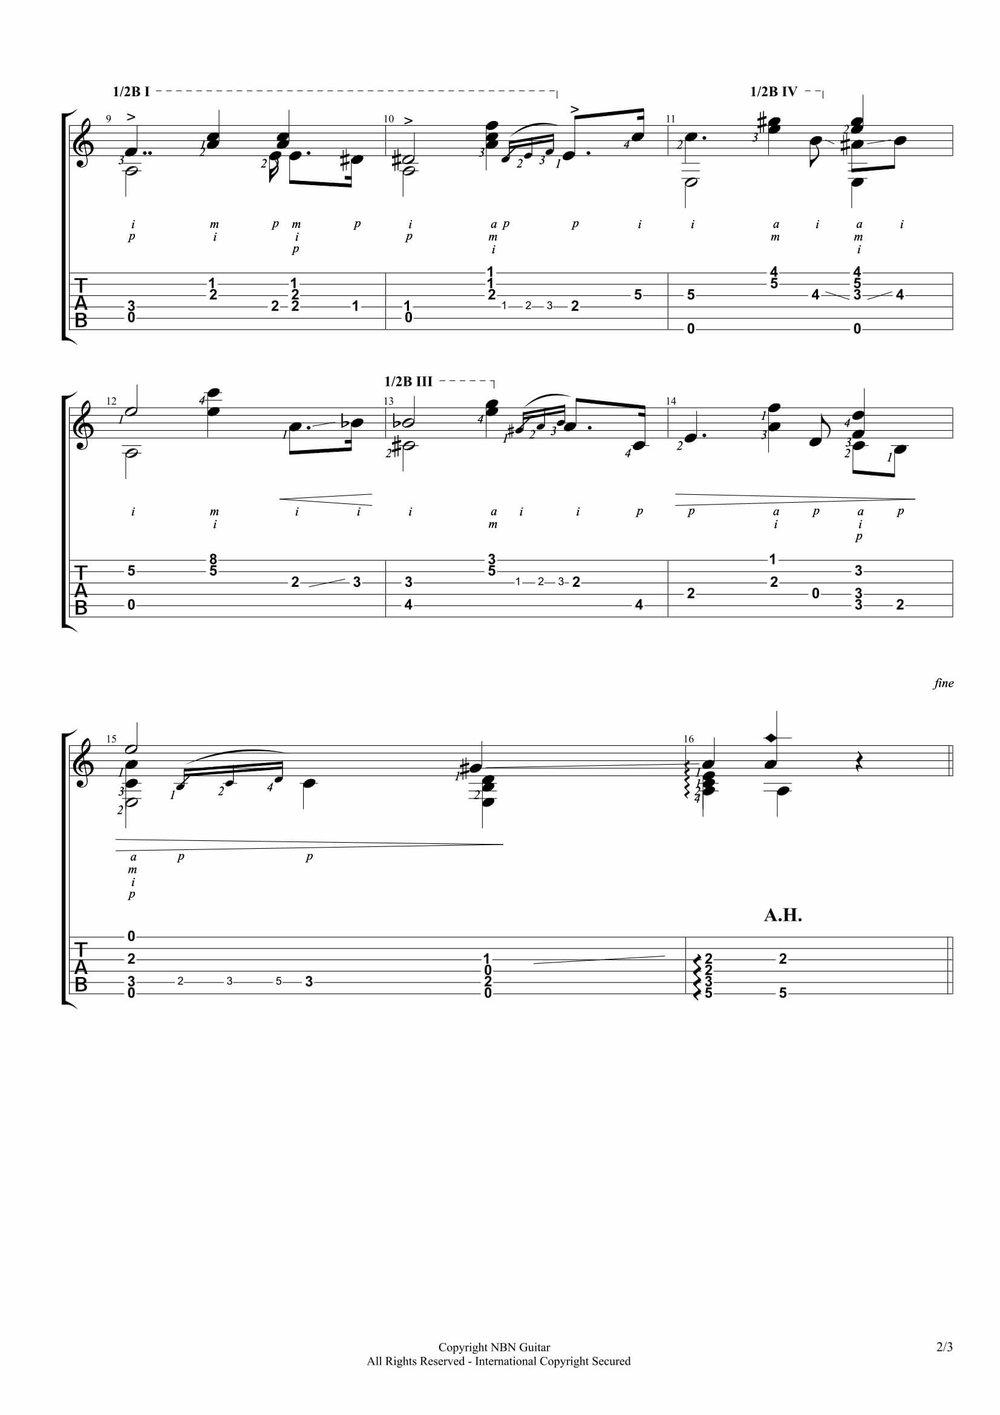 Marieta 'Mazurka' (Sheet Music & Tabs)-p2.jpg